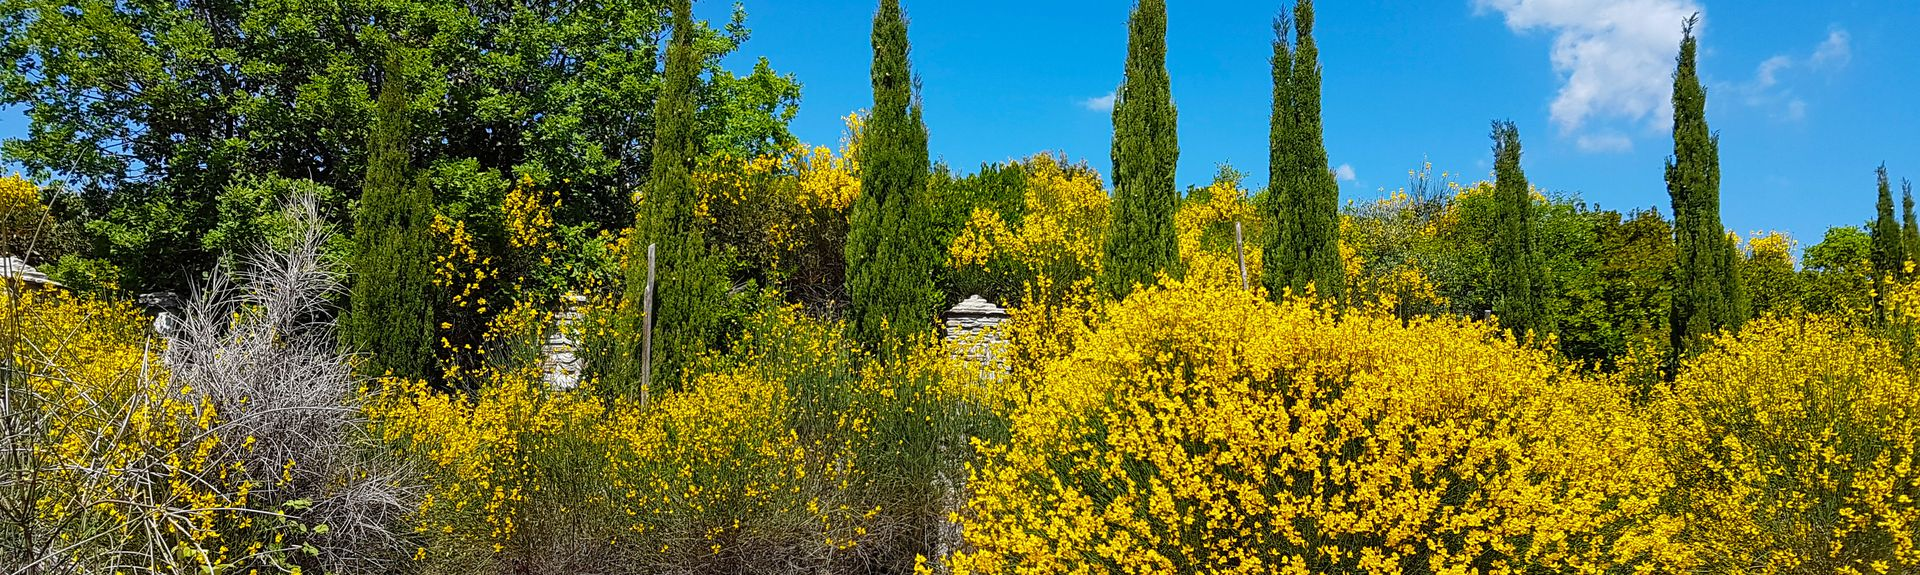 Sporades, Thessalia Sterea Ellada, Kreikka